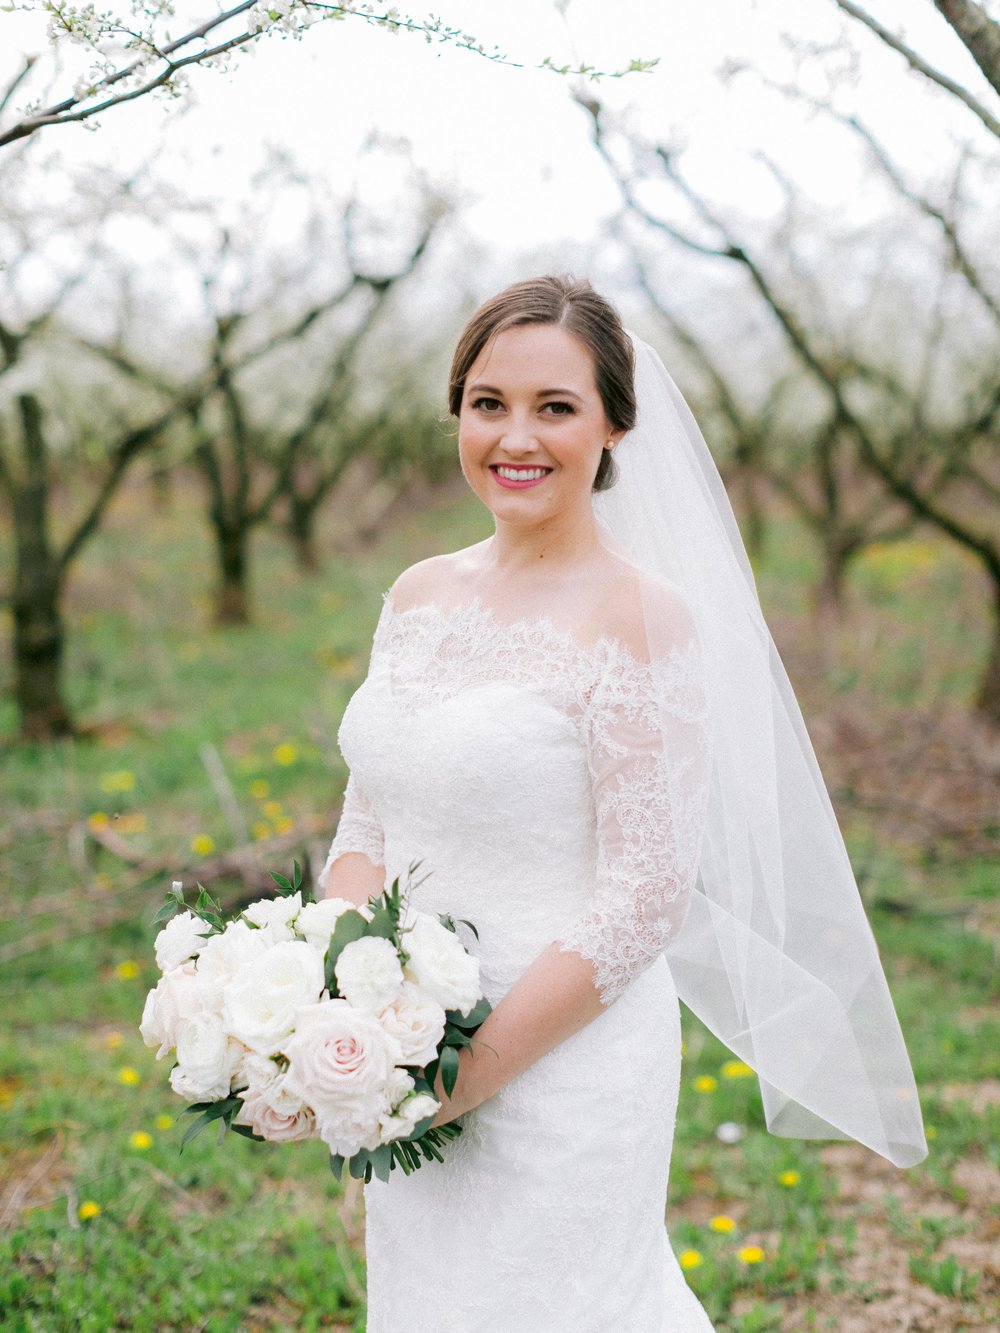 Niagara_on_the_lake_spring_wedding_kurtz_orpia_toronto_Vineyard_wedding_fine_art (65 of 92).jpg